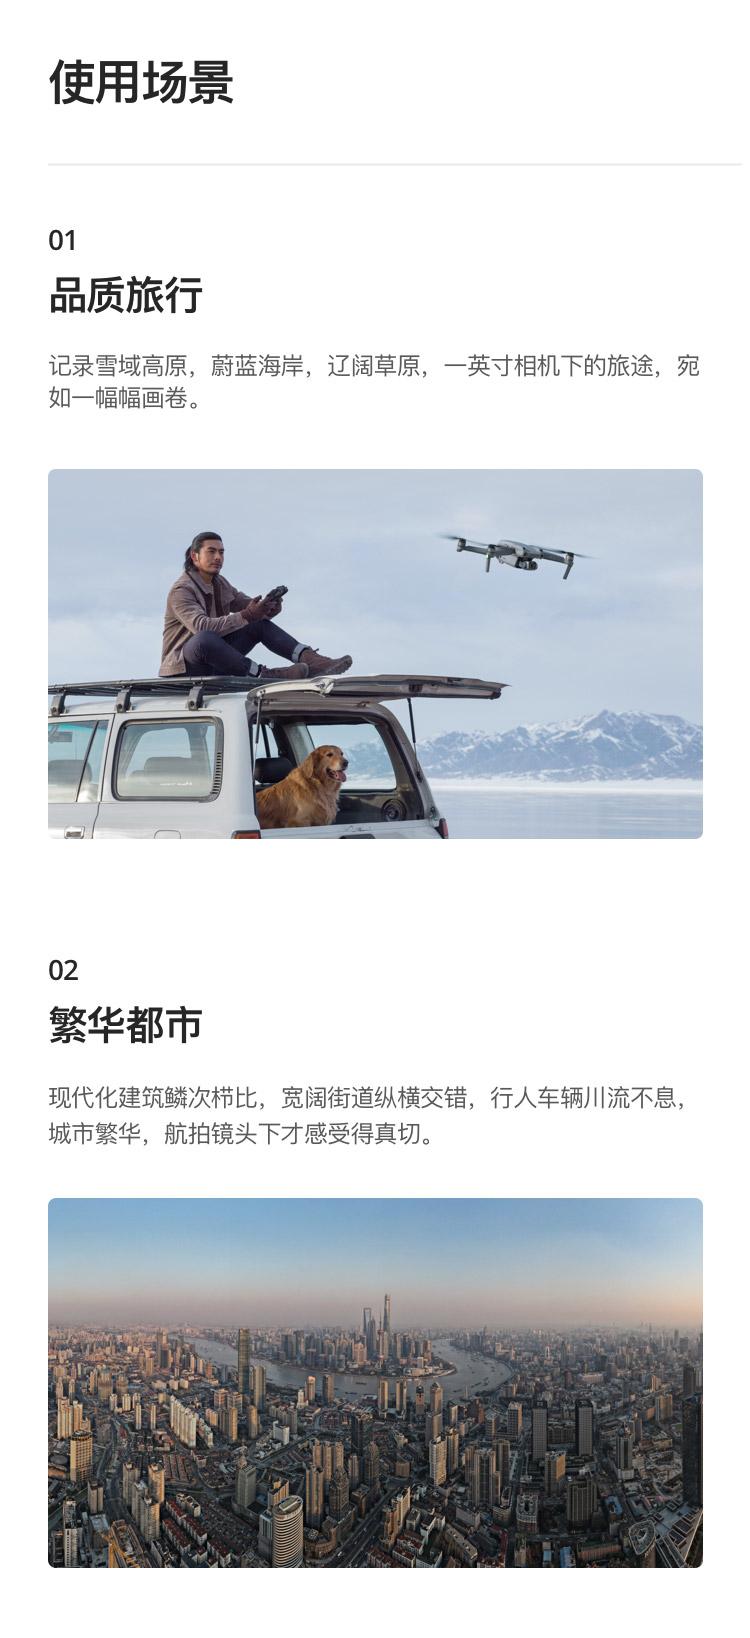 DJI Air 2S免费试用,评测